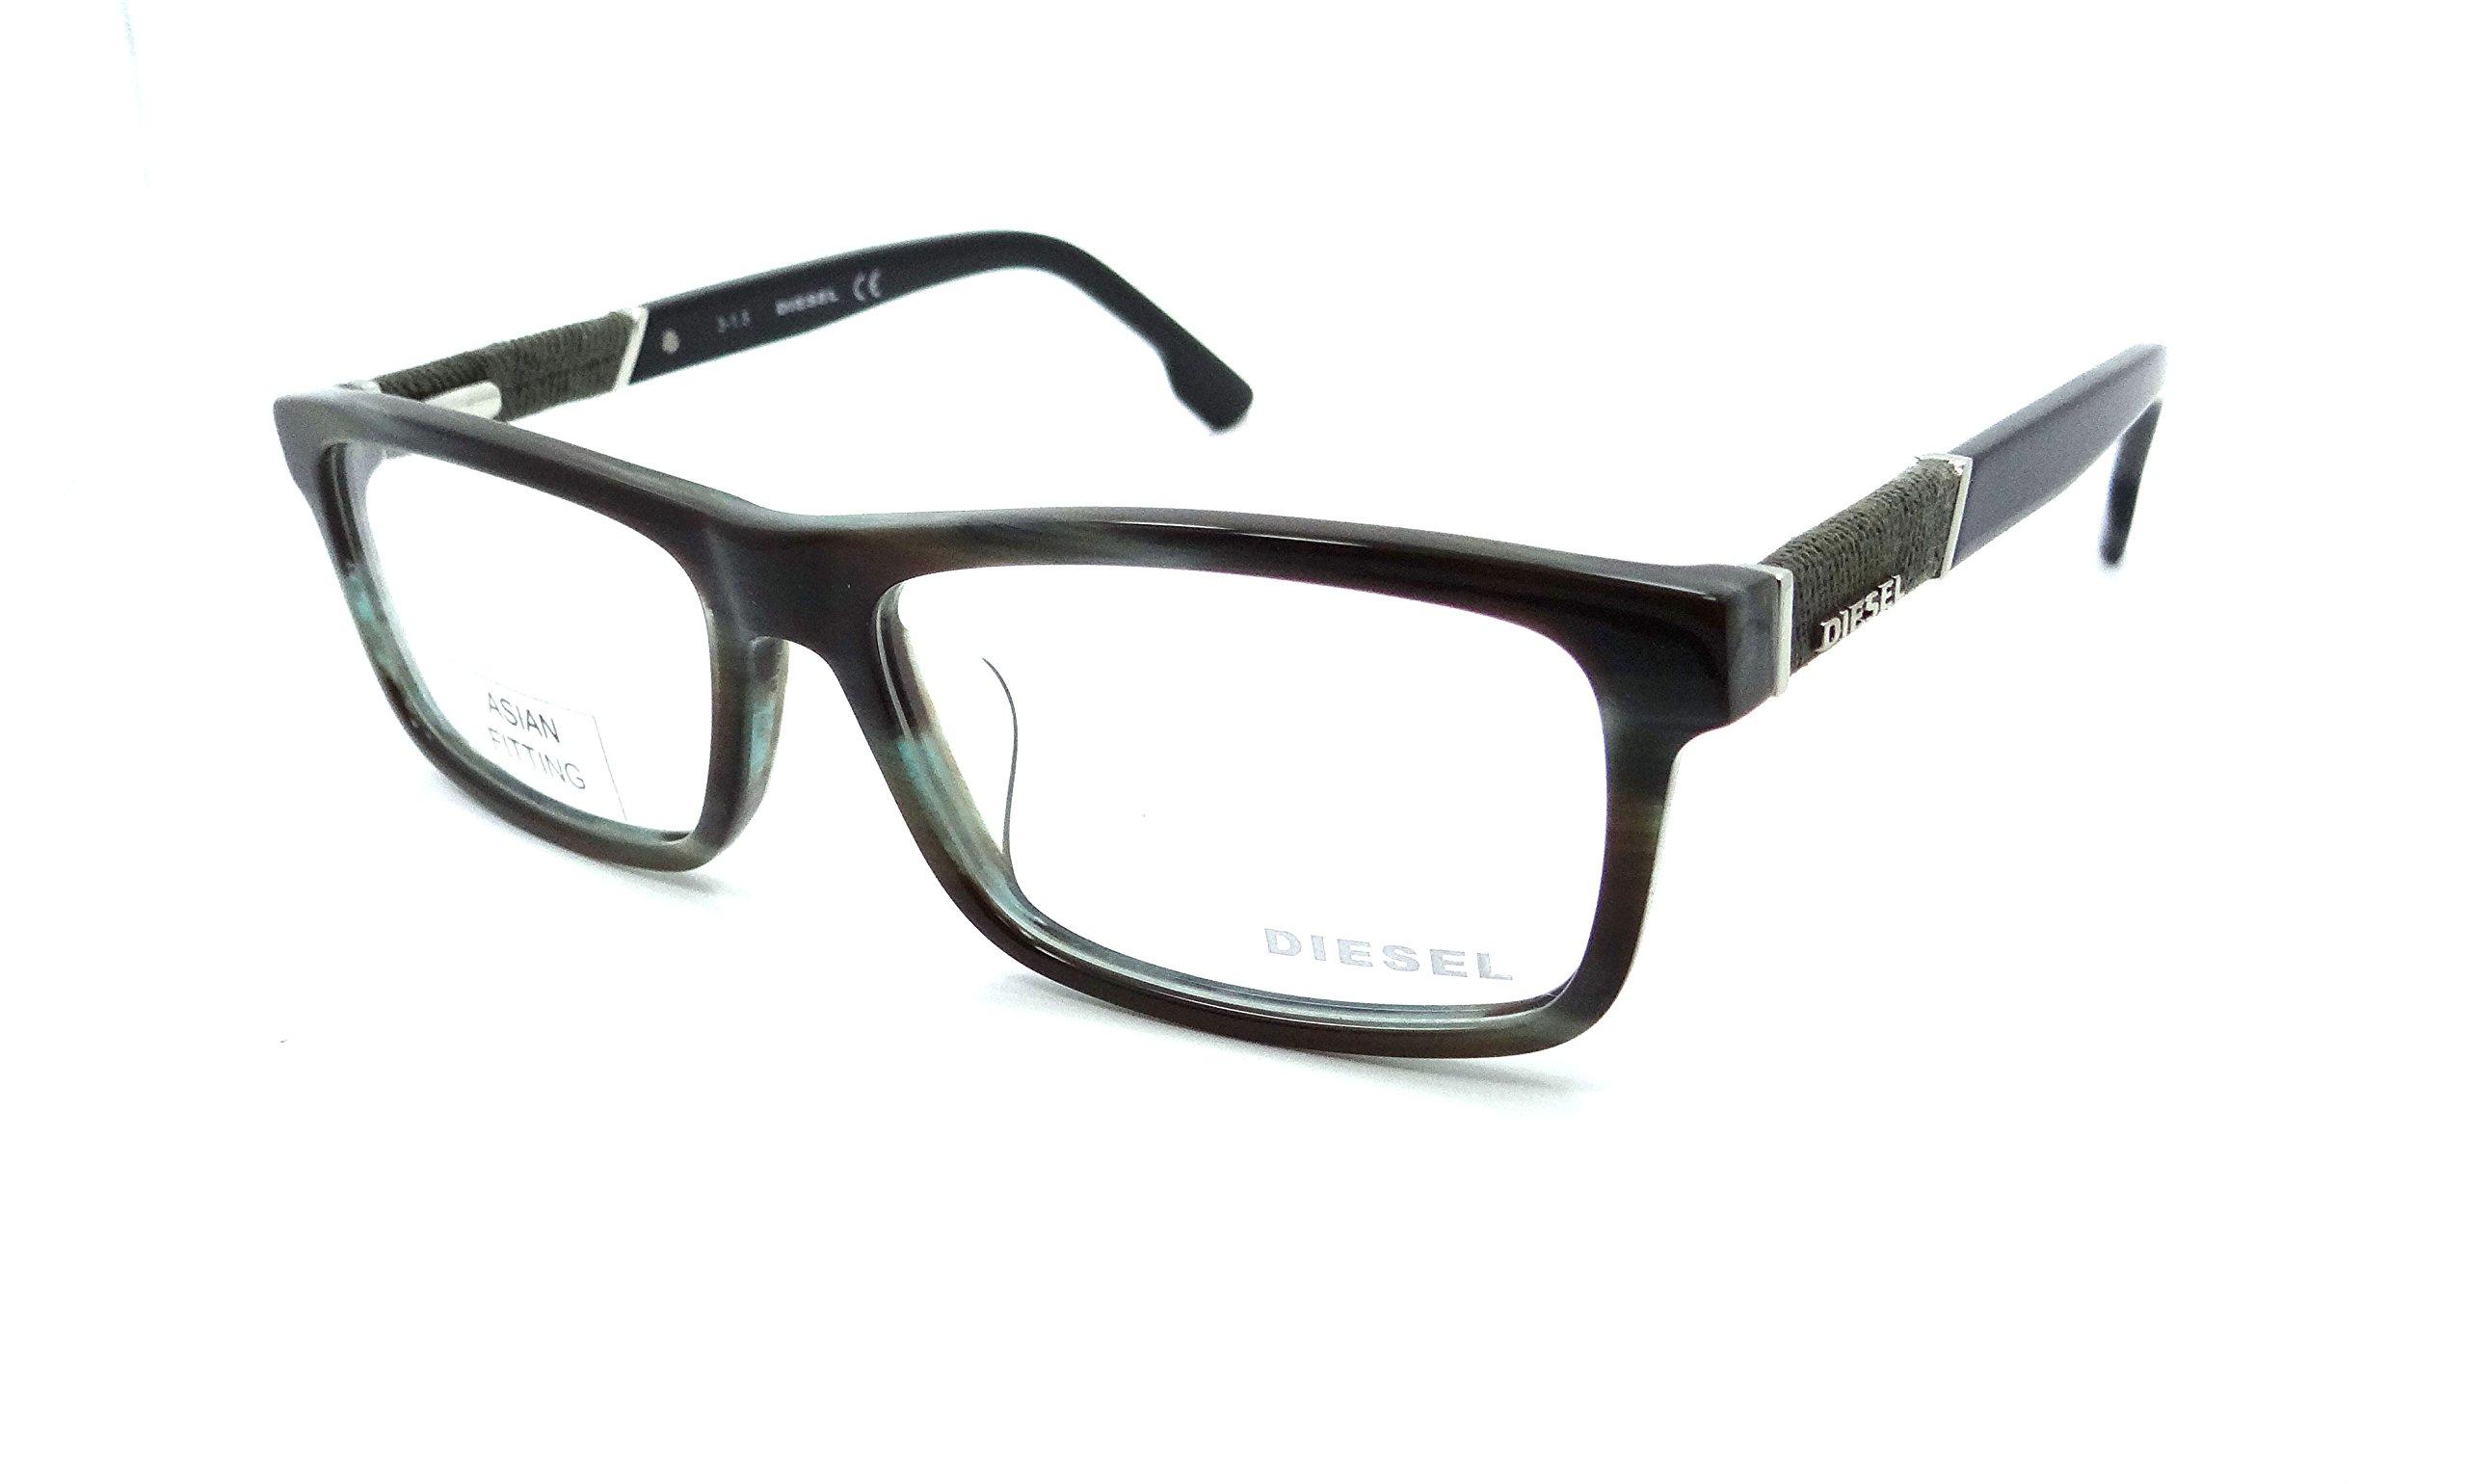 Diesel Rx Eyeglasses Frames DL5126-F 095 58-16-150 Brown Grey Striped Asian Fit